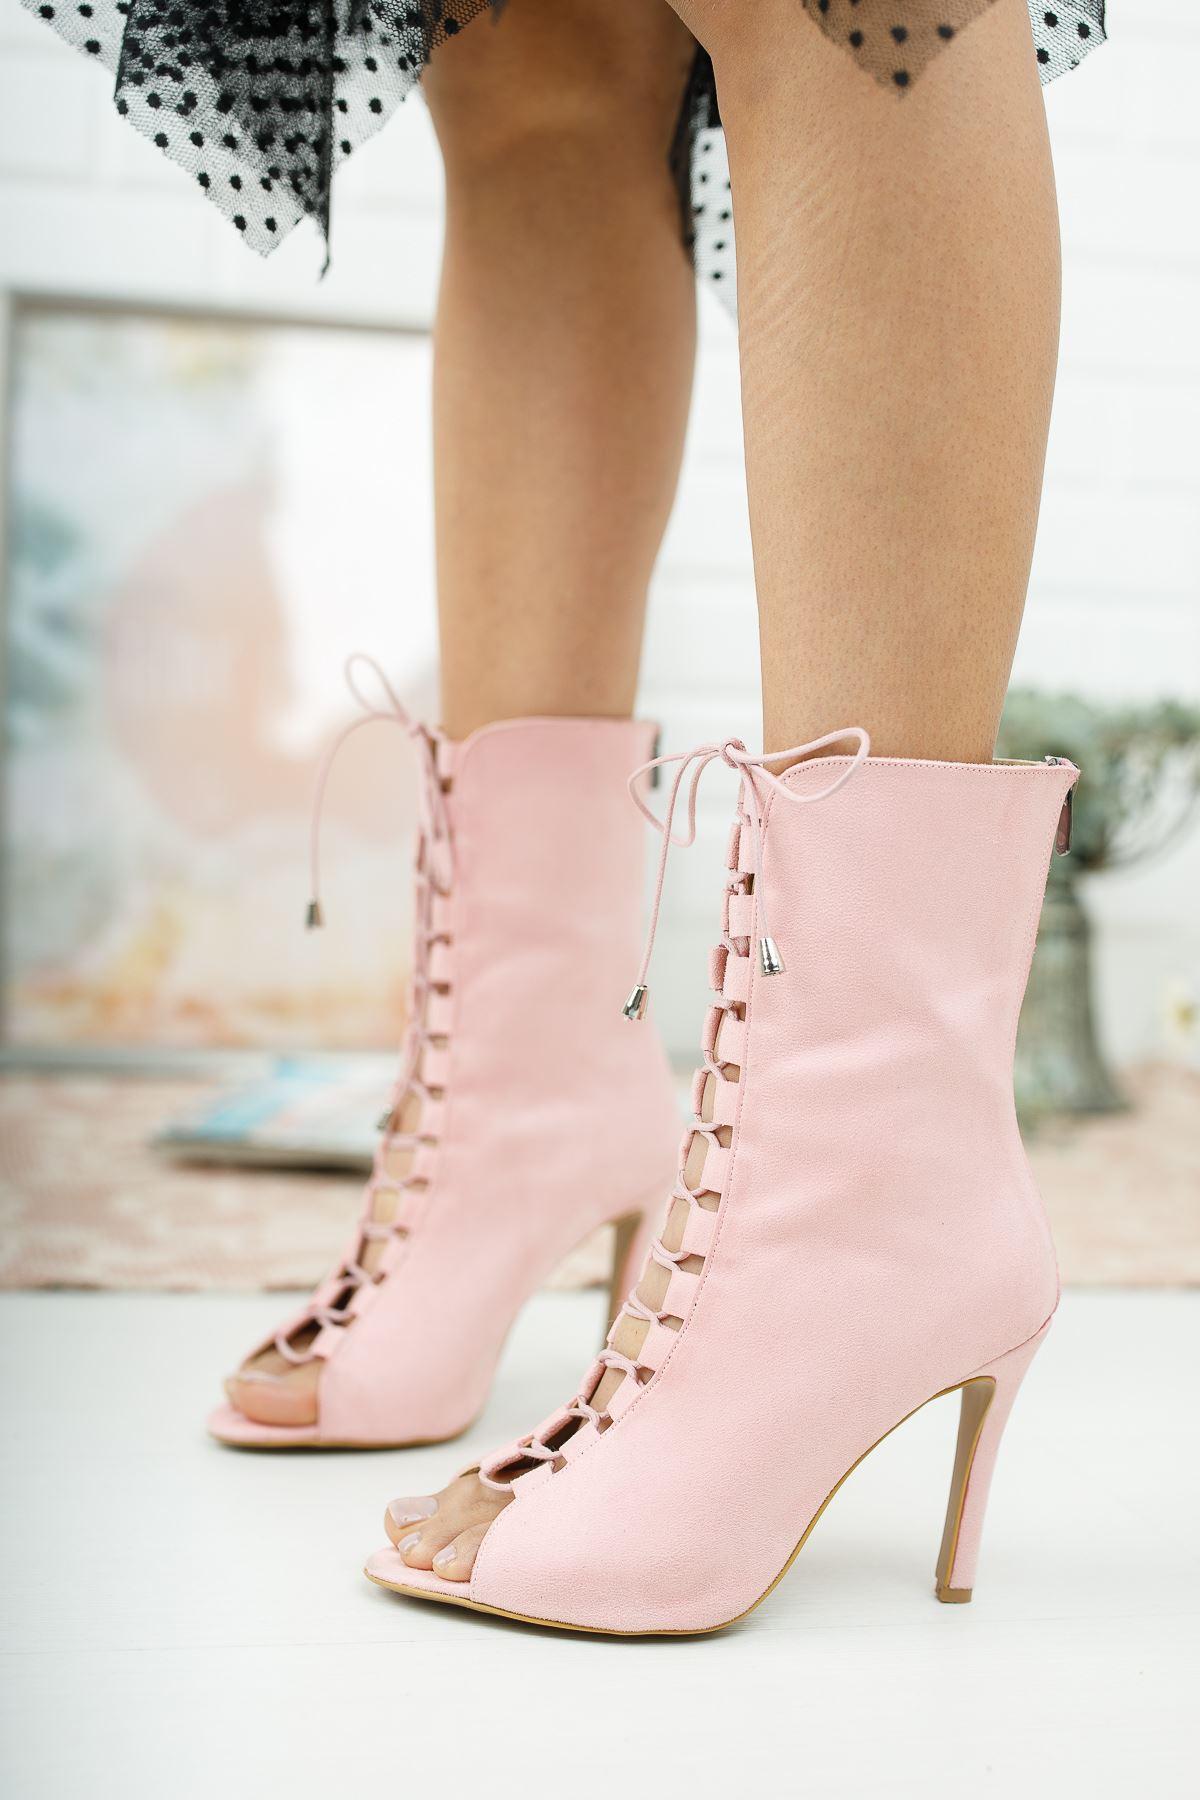 Brisa Pembe Süet Topuklu Ayakkabı